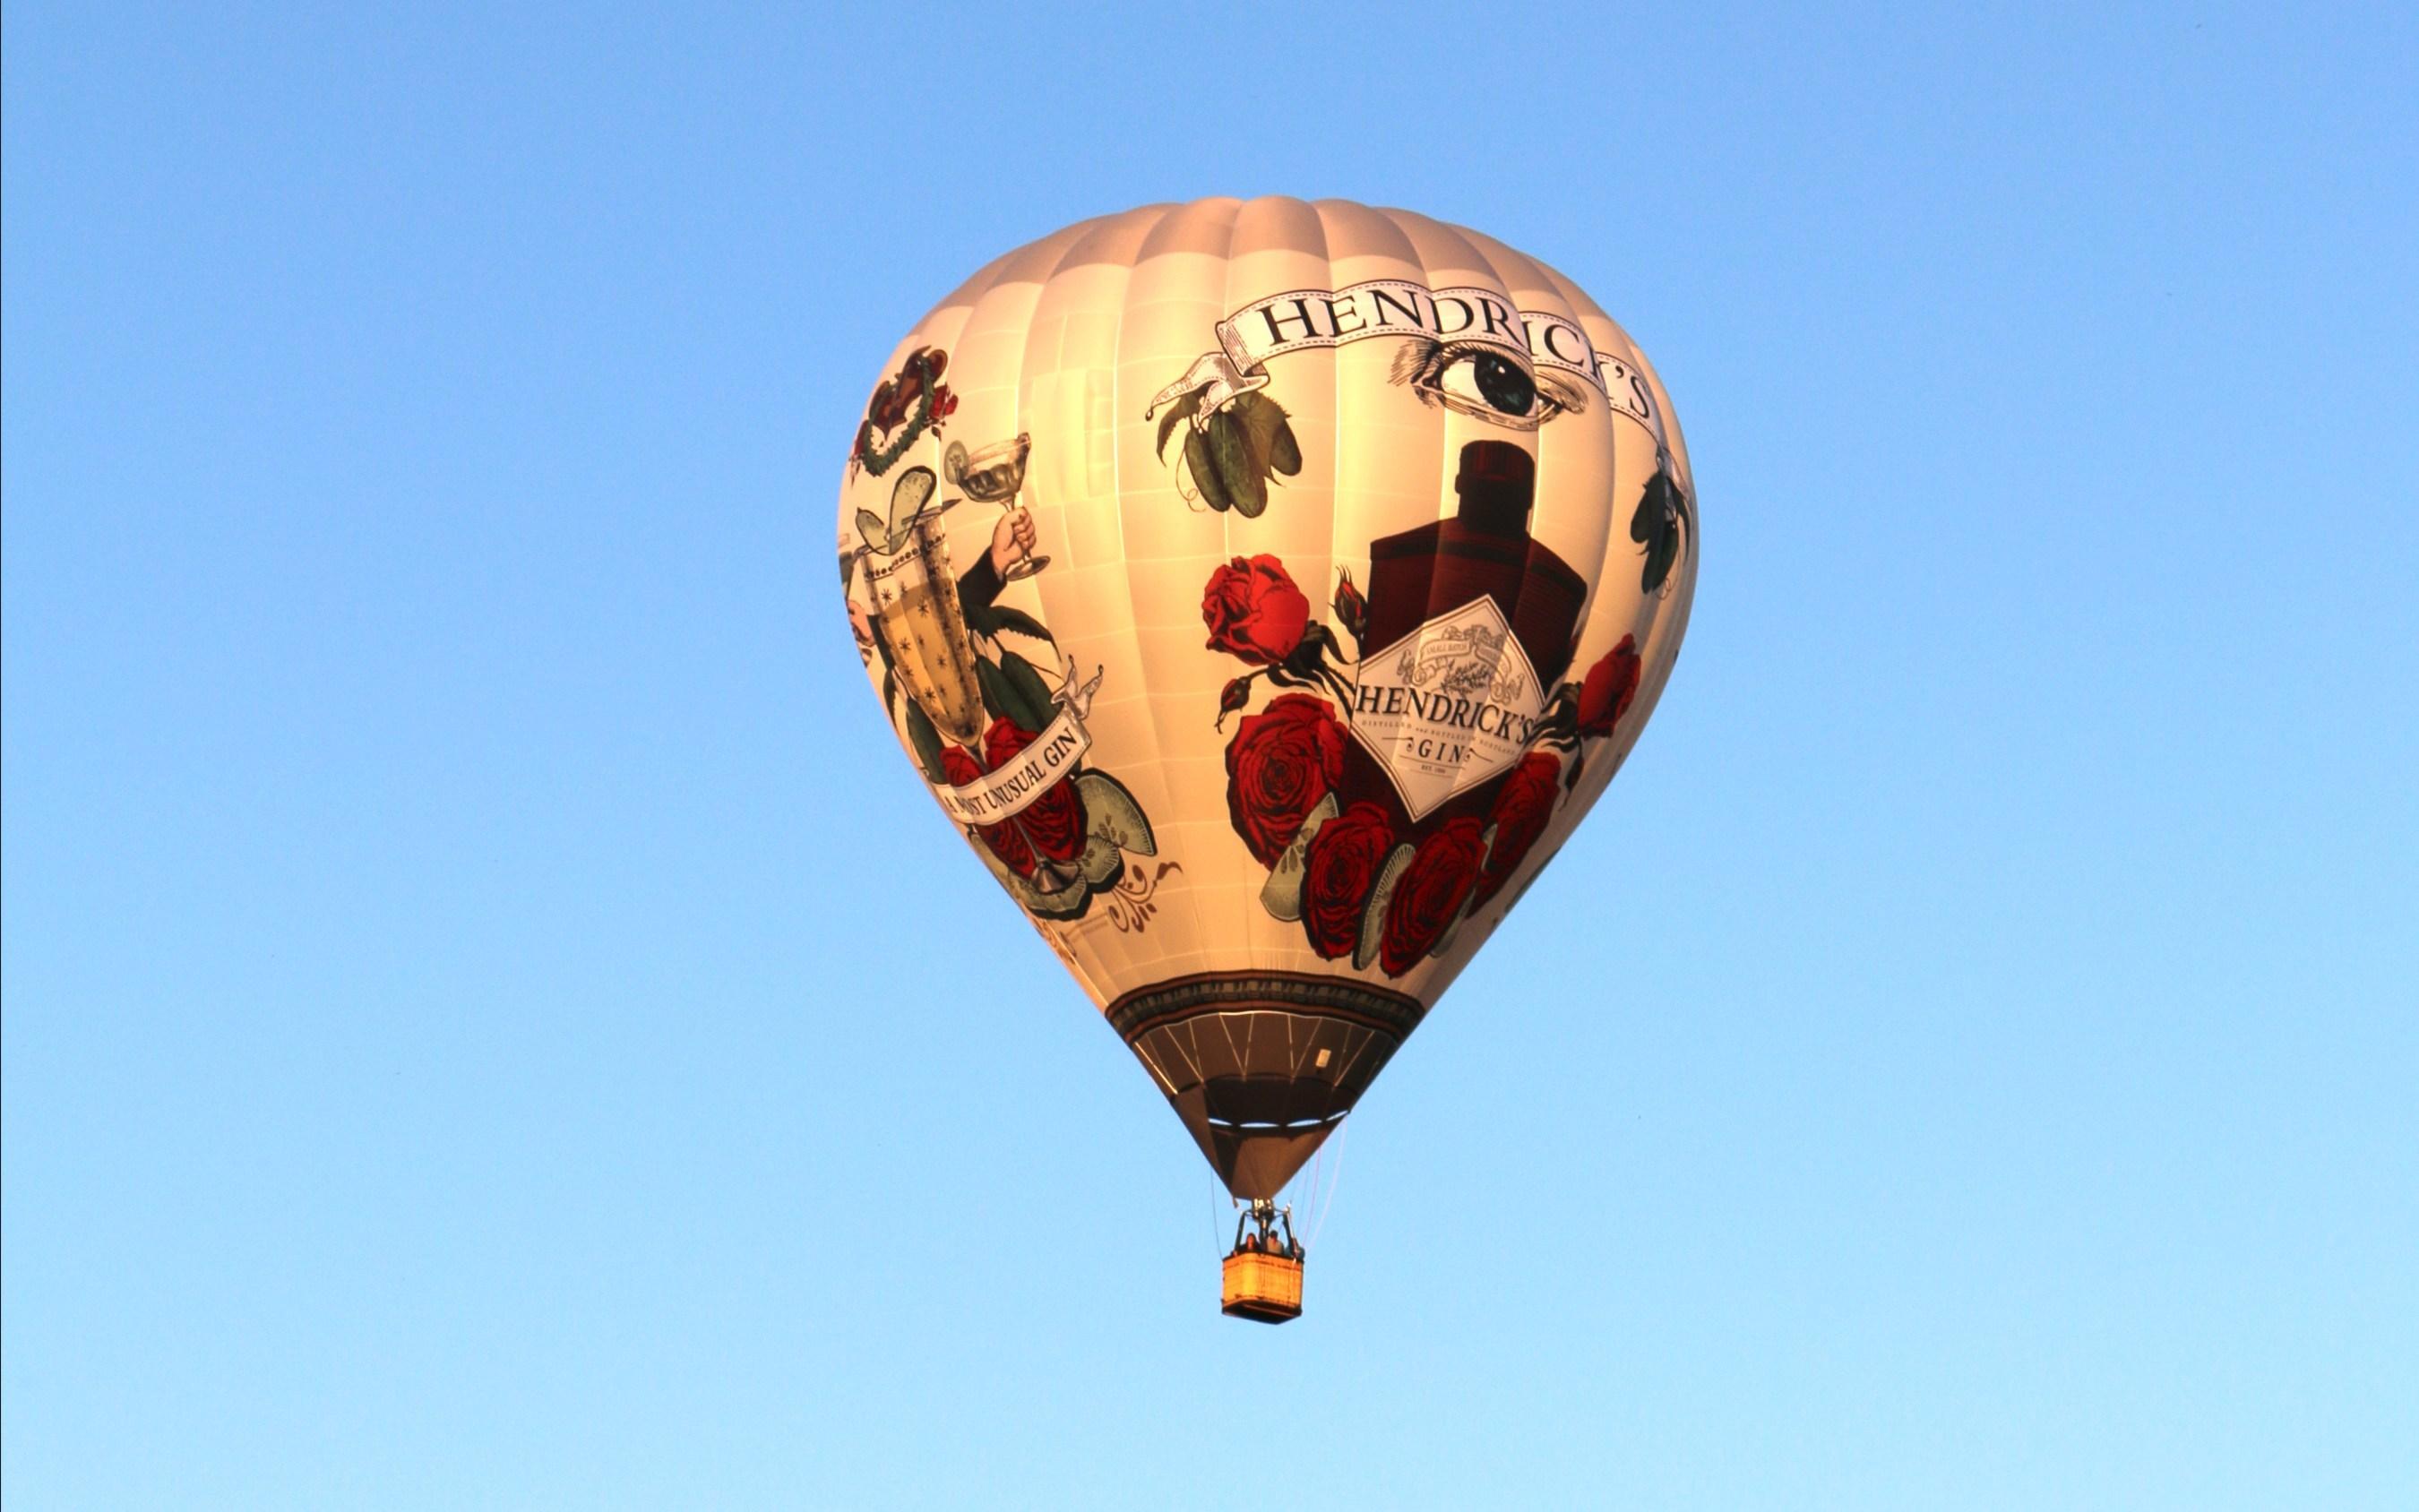 af1e56d81a13 Hendrick_s_Gin_Hendrick_s_Gin_Hot_Air_Balloon_Takes_Flight_at_Nu.jpg?p=publish